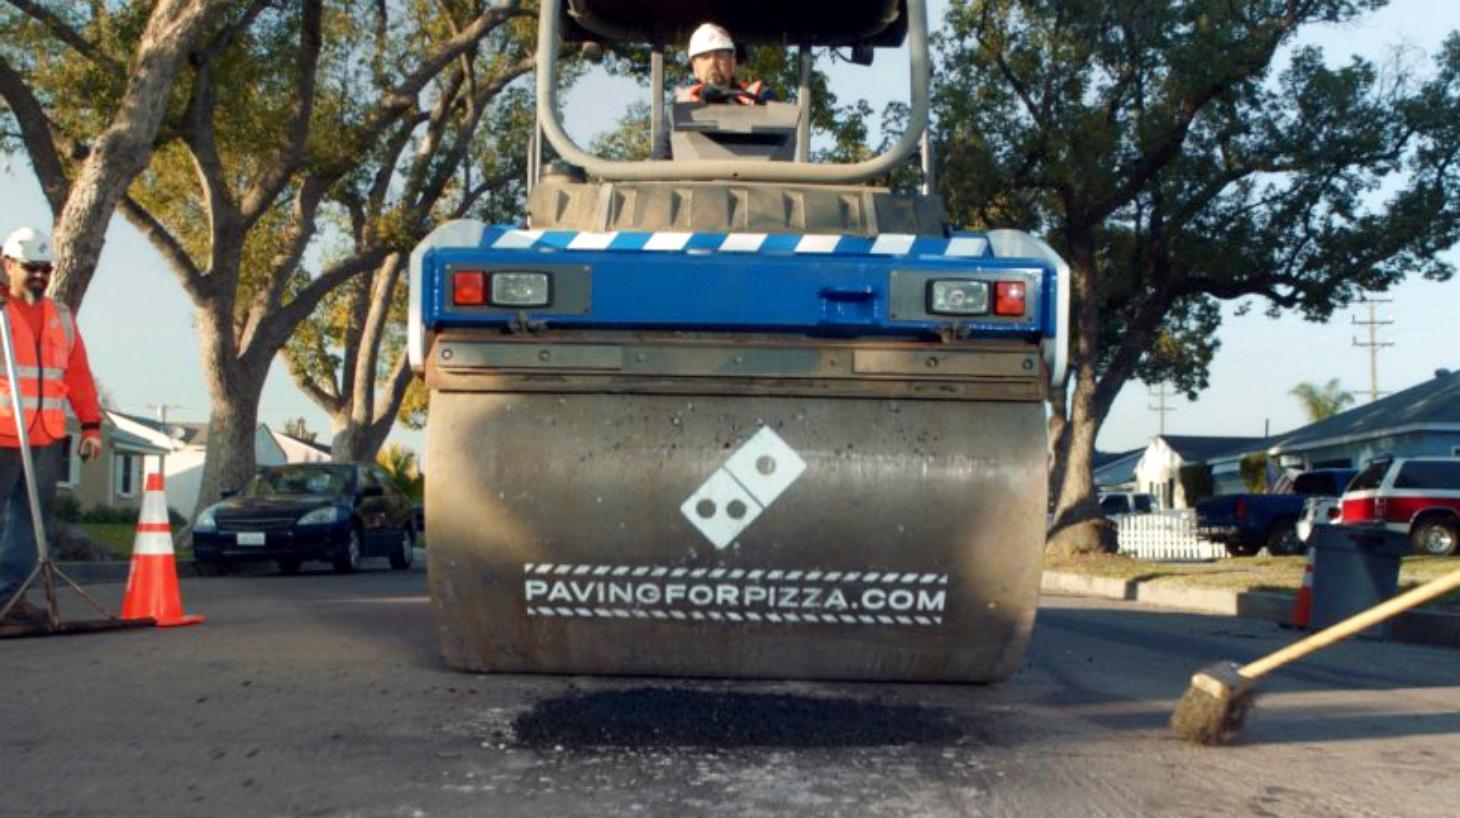 Domino's Fixes Potholes in Pizza Protection Scheme